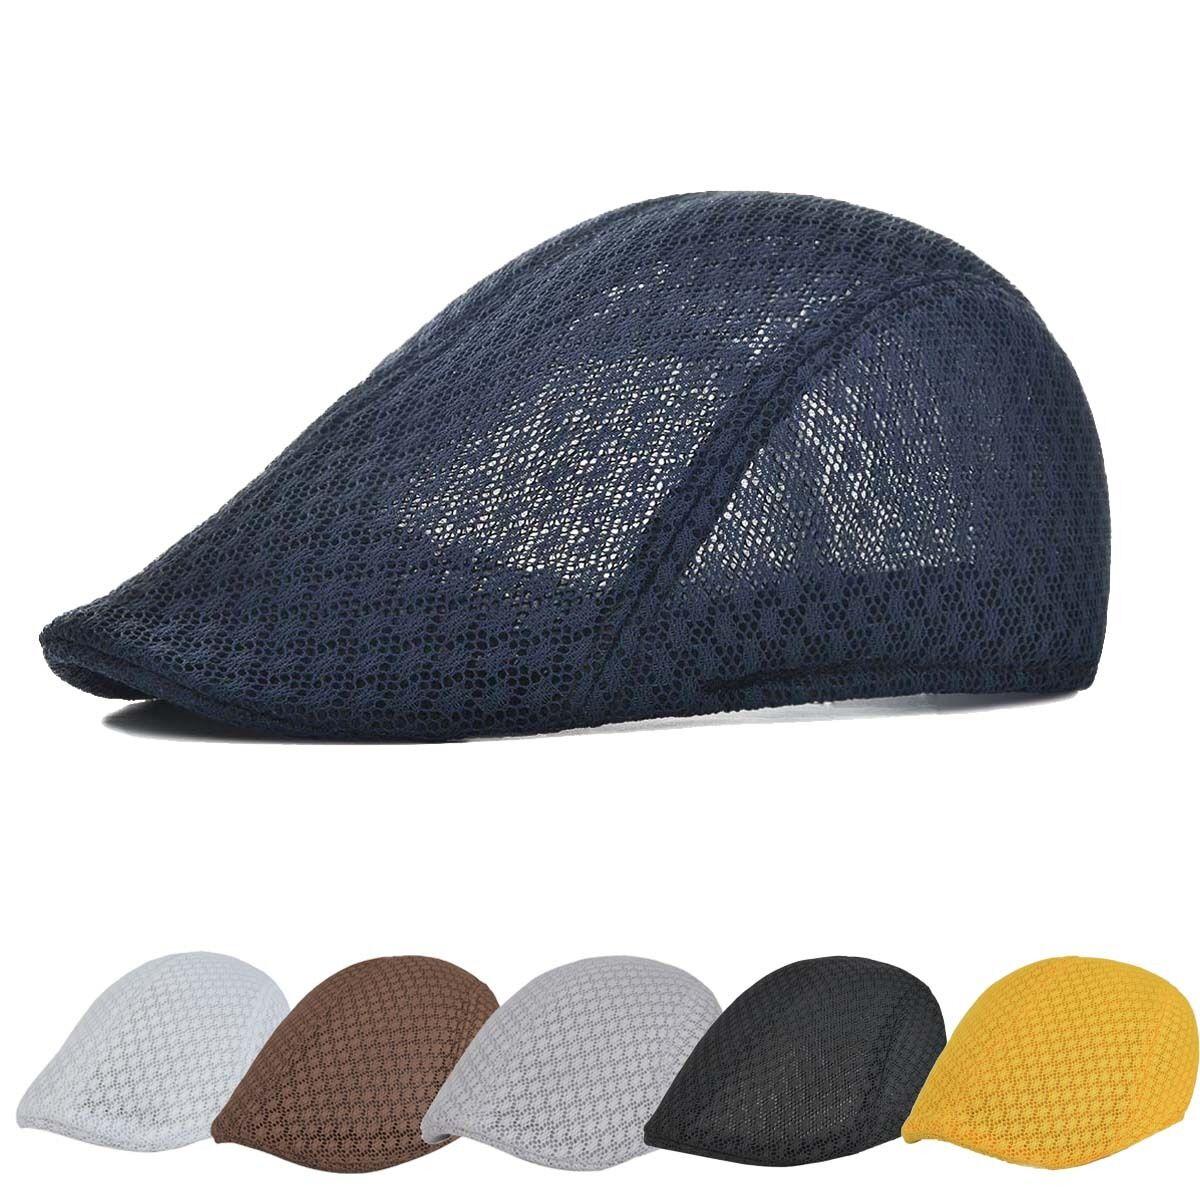 4a487be9388 Summer Unisex Breathable Mesh Beret Hat Golf Cabbie Flat Gatsby Caps  Headdress